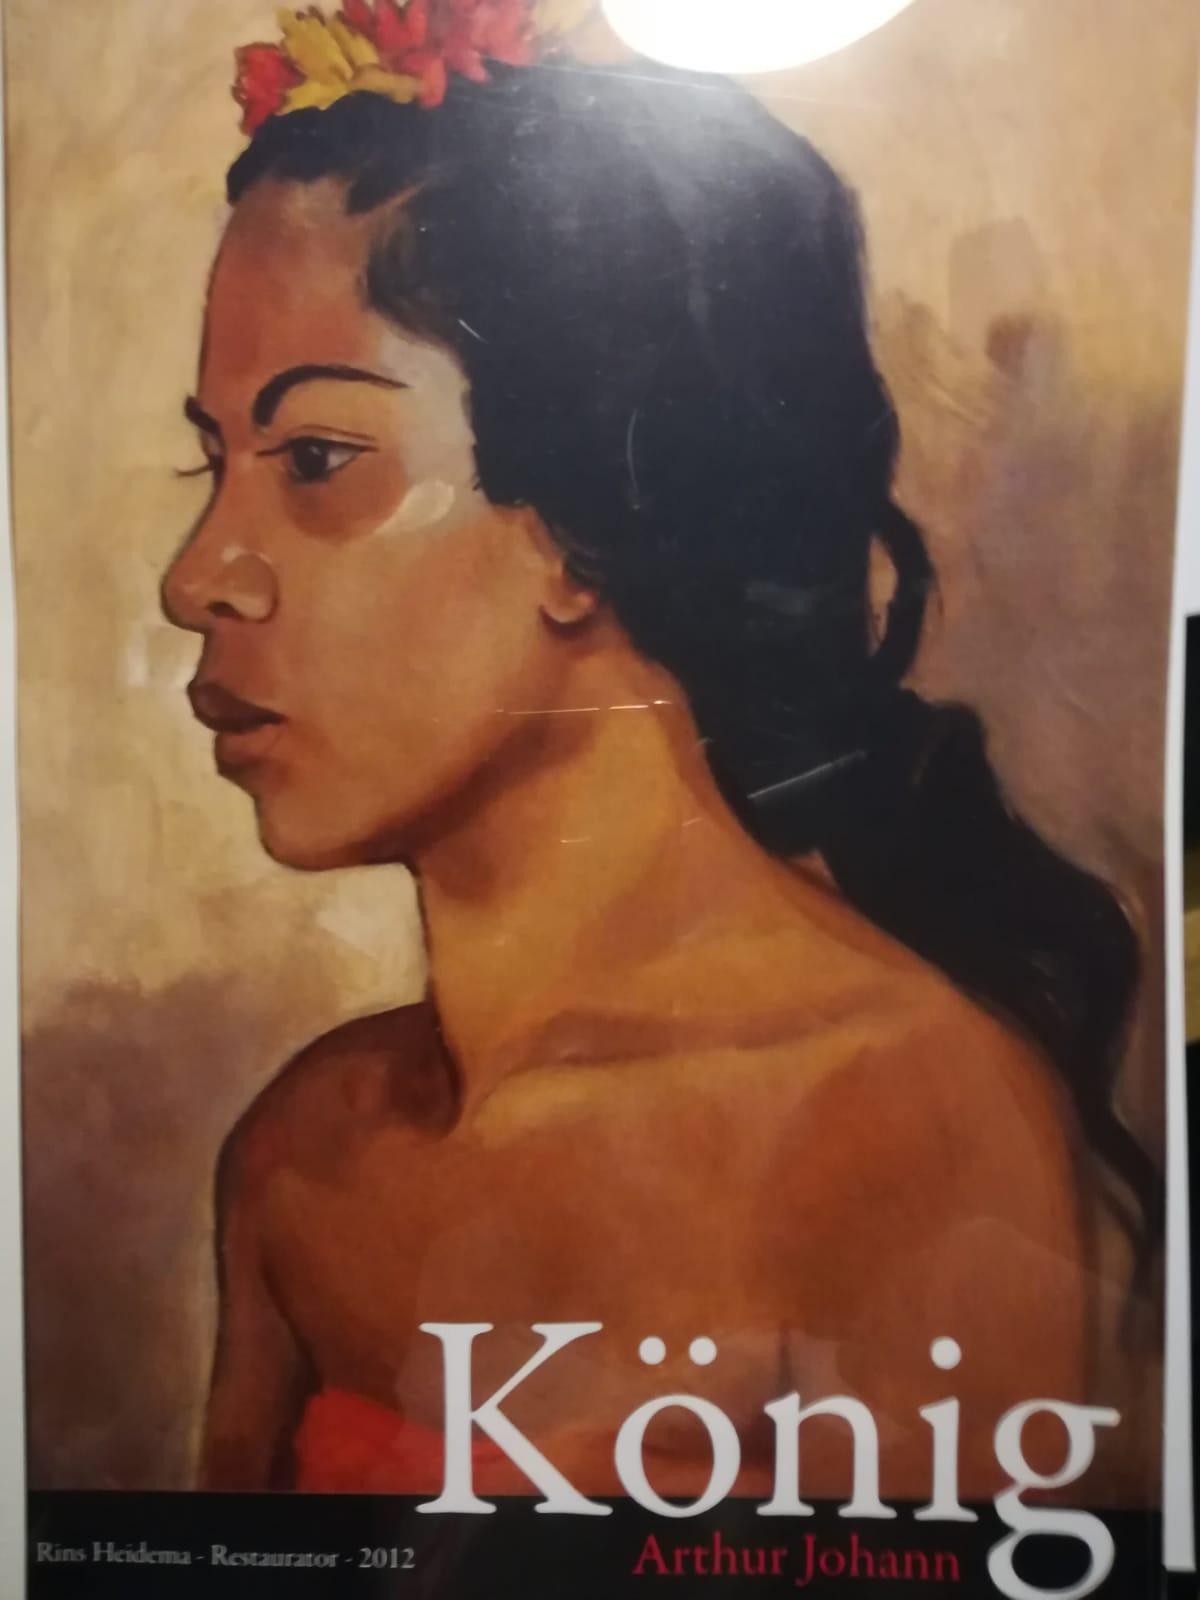 ARTHUR JOHANN JO KÖNIG (GERMAN, ?-1951) - BALINESE WOMAN - Image 3 of 5